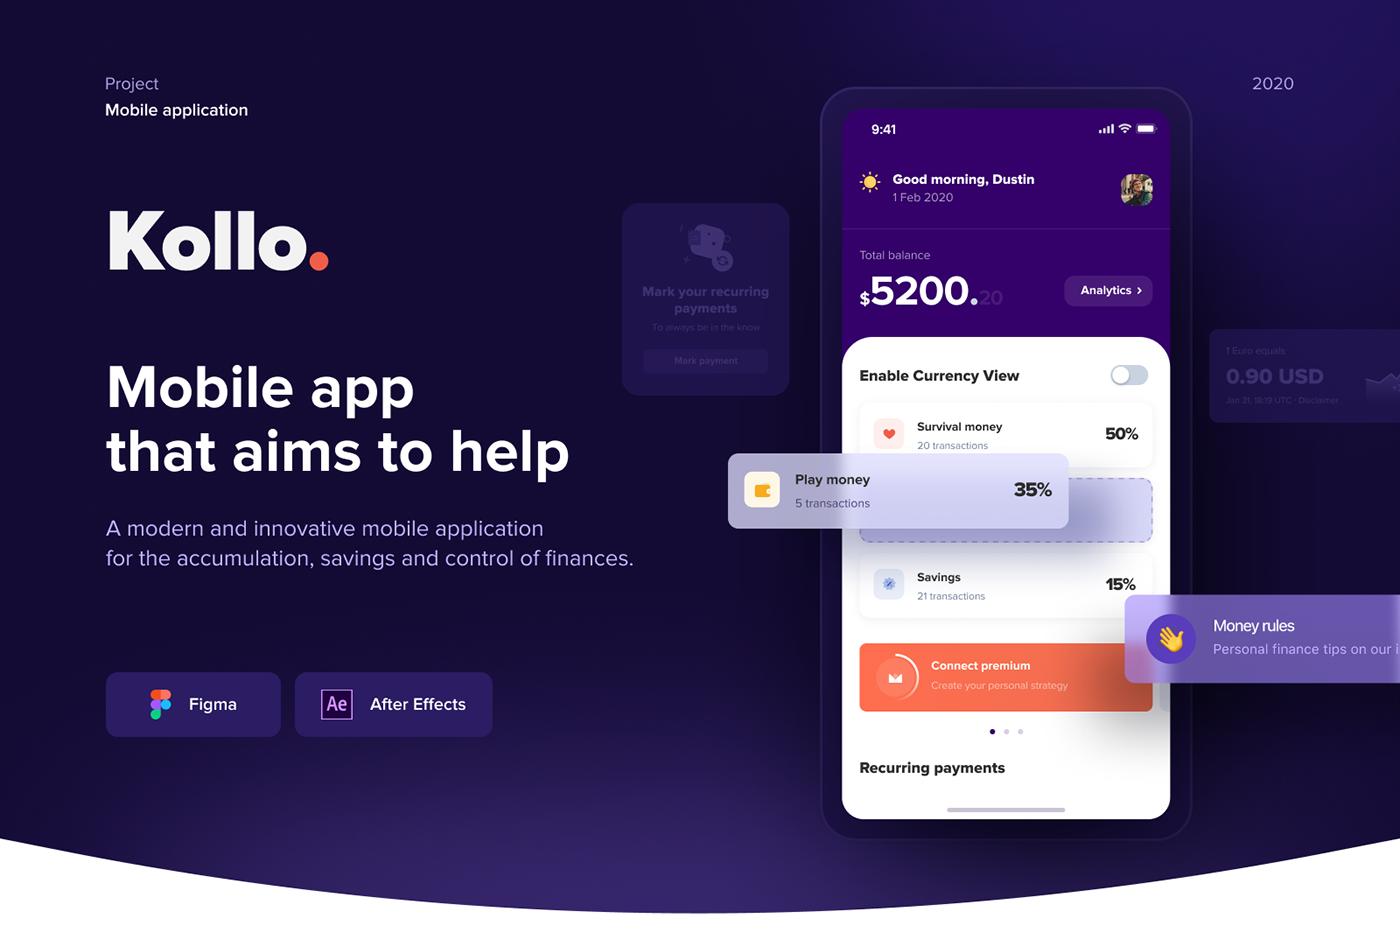 app Budget Budgeting credit finances financial Fintech iosapp mobileapp WALLET